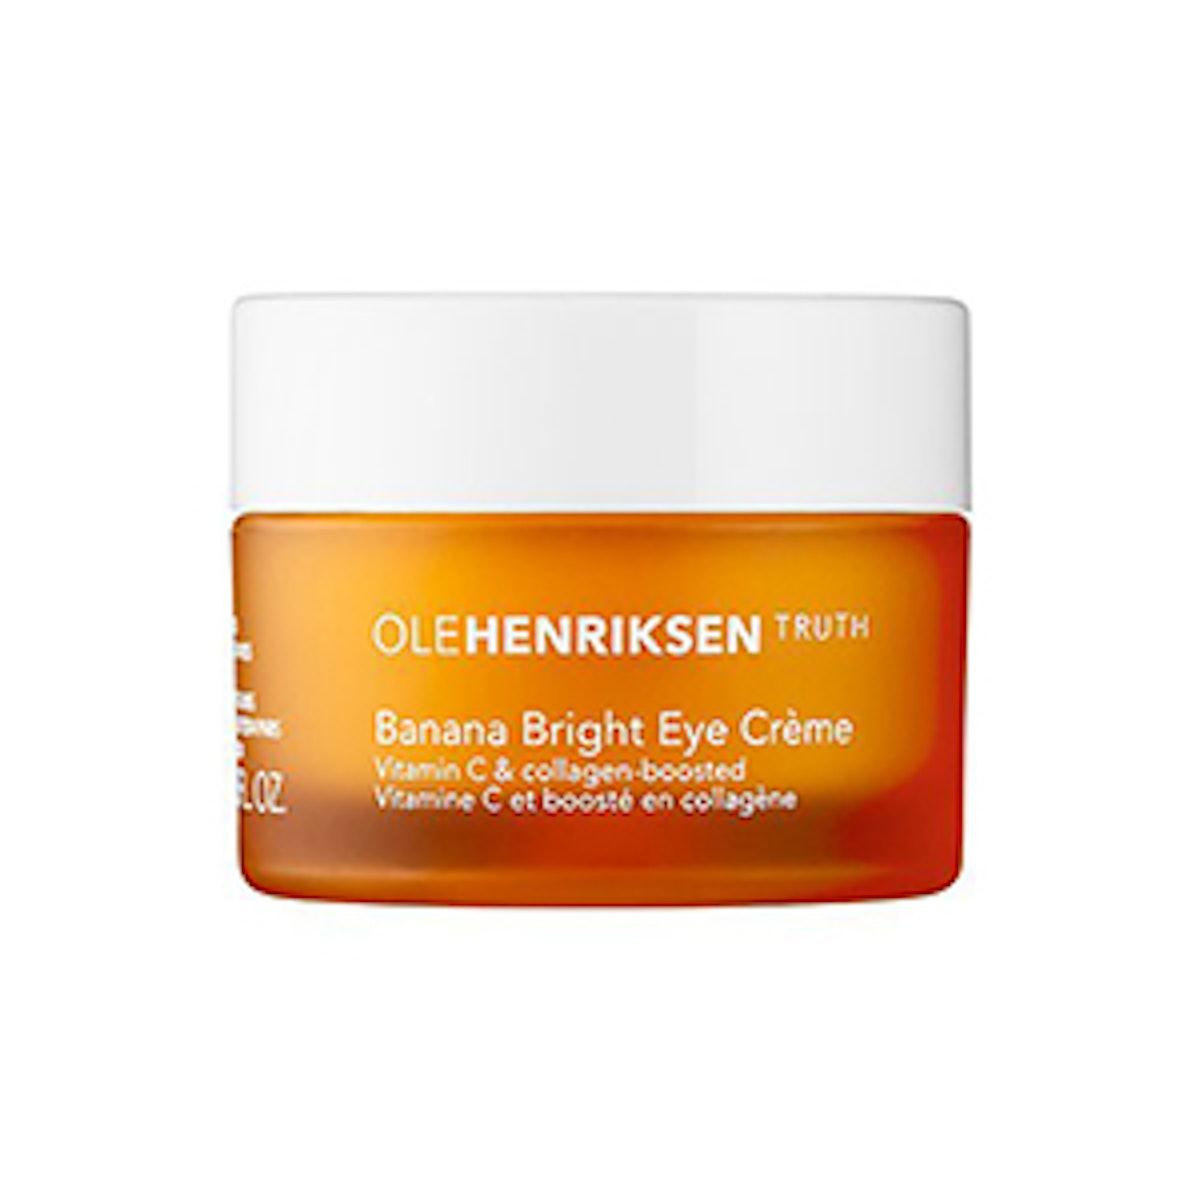 Banana Bright Eye Crème